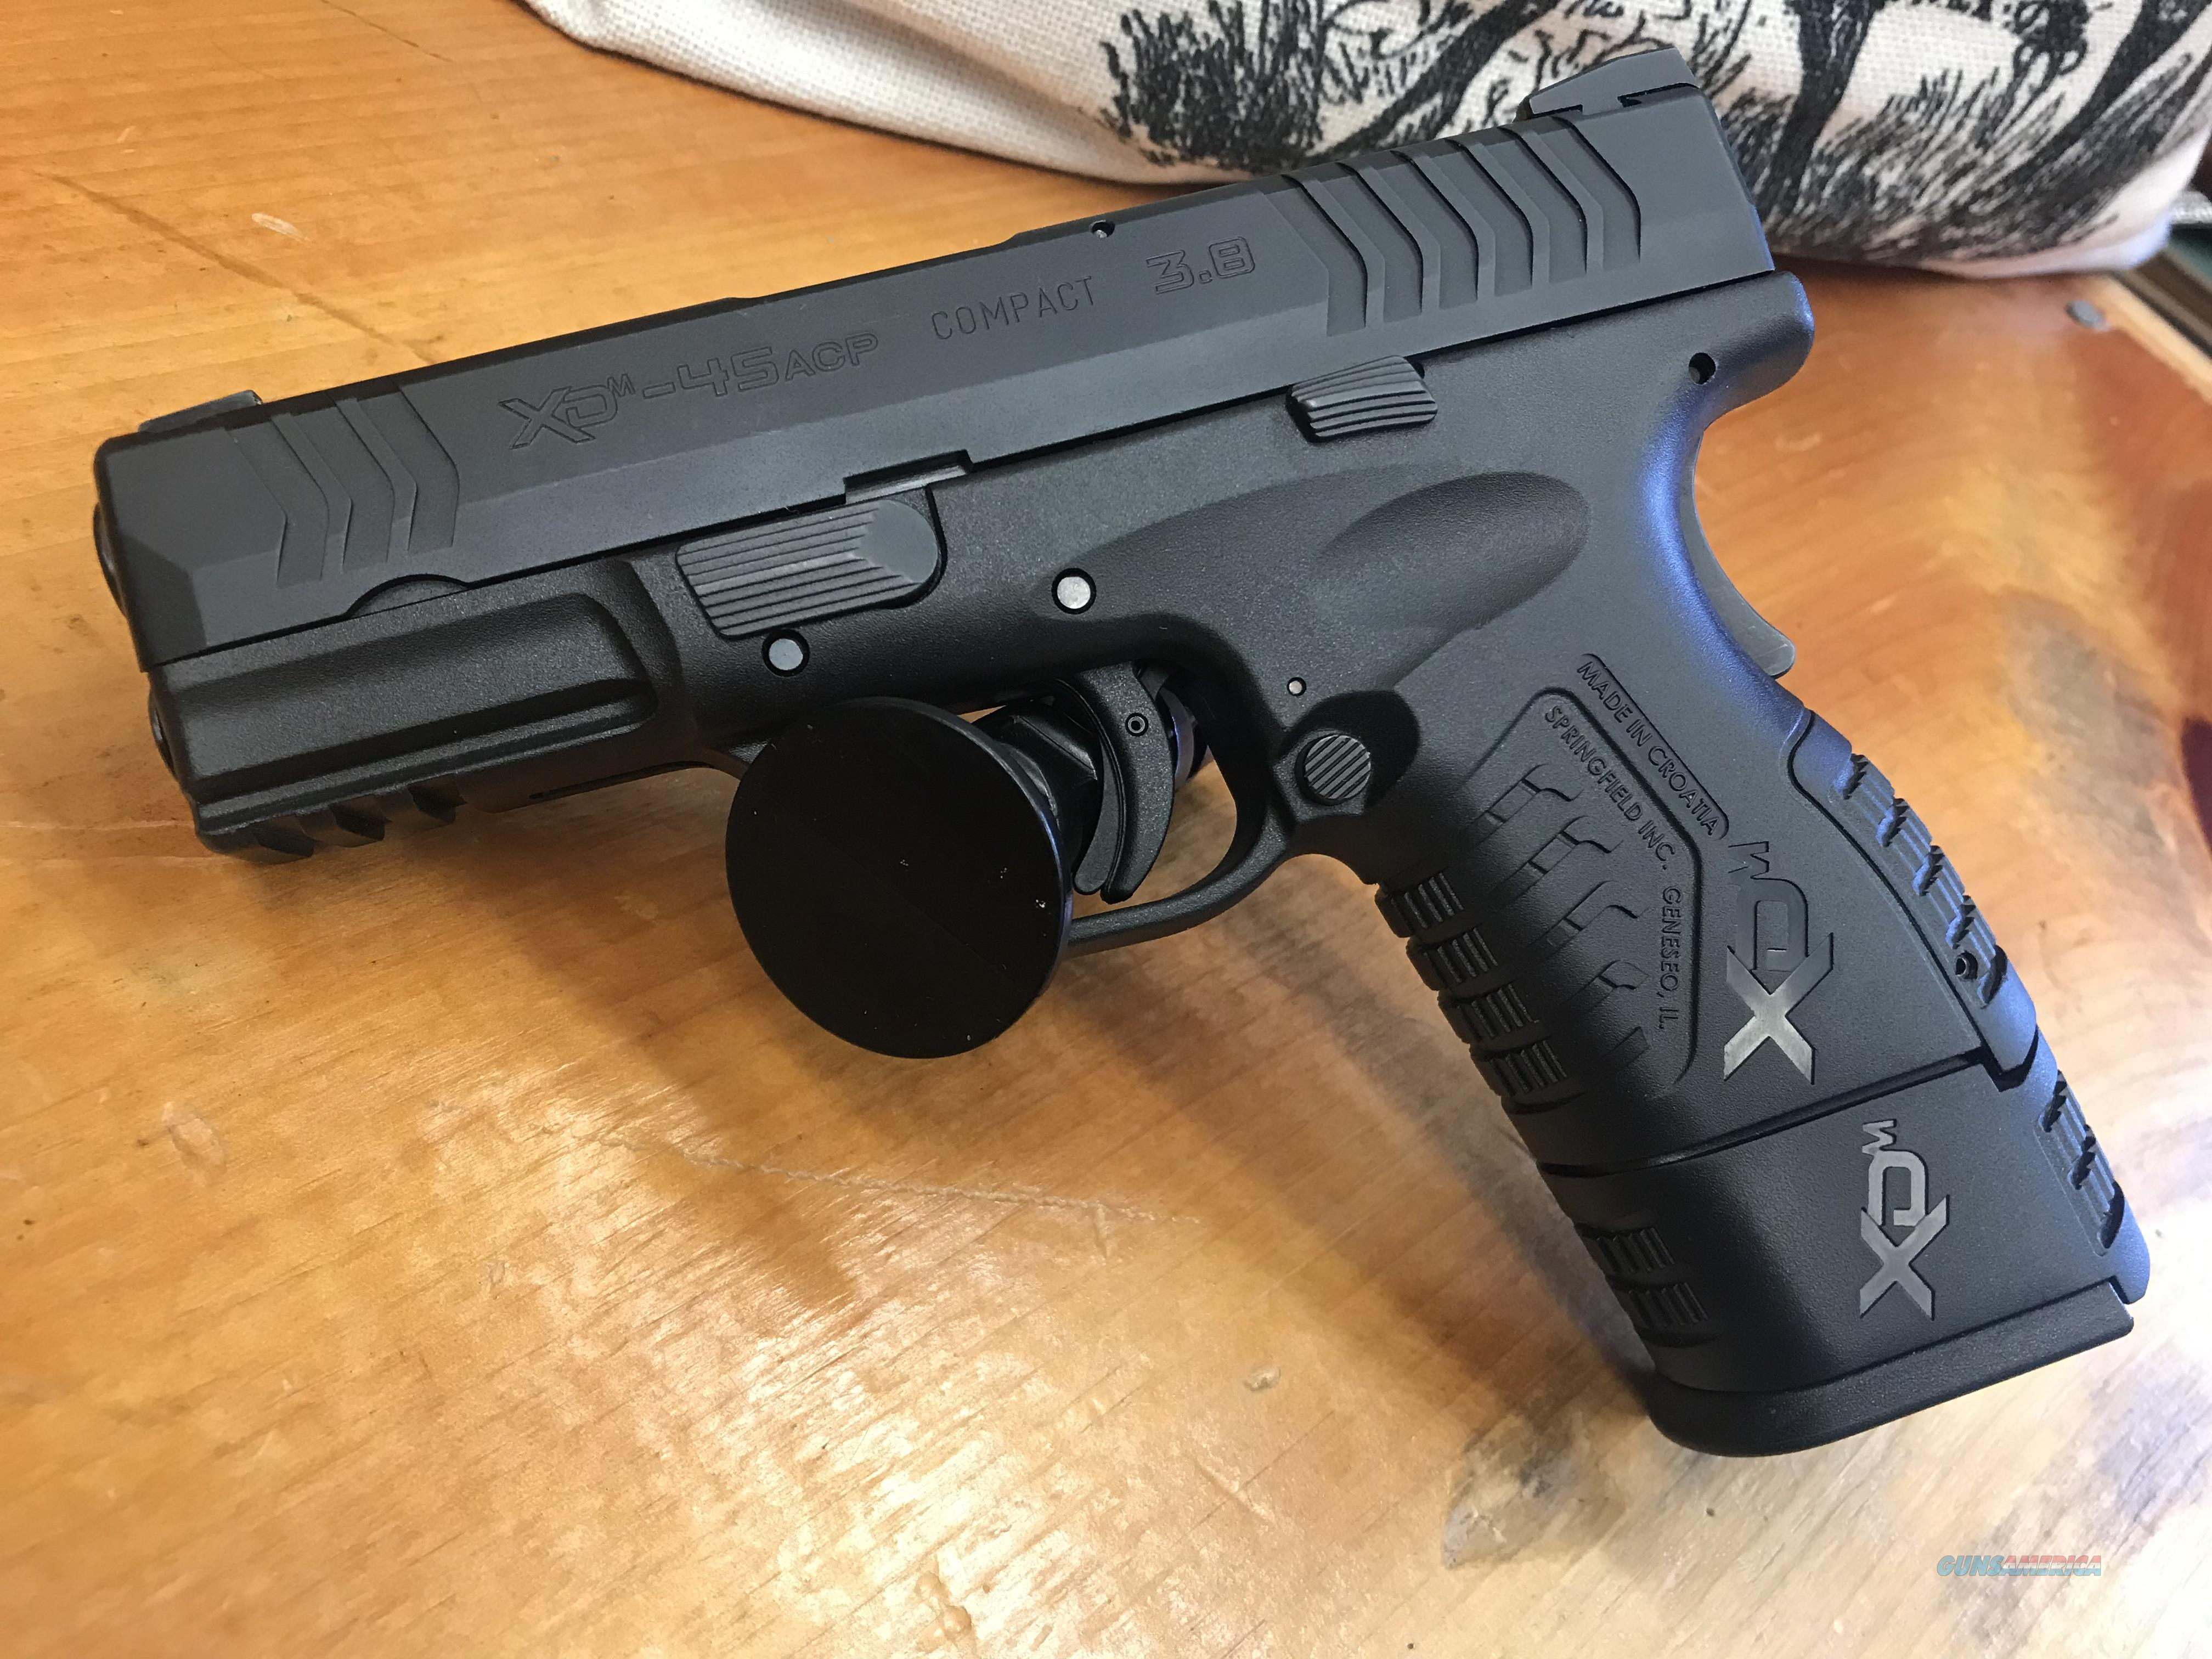 Springfield XDM Compact .45acp 3.8  Guns > Pistols > Springfield Armory Pistols > XD-M